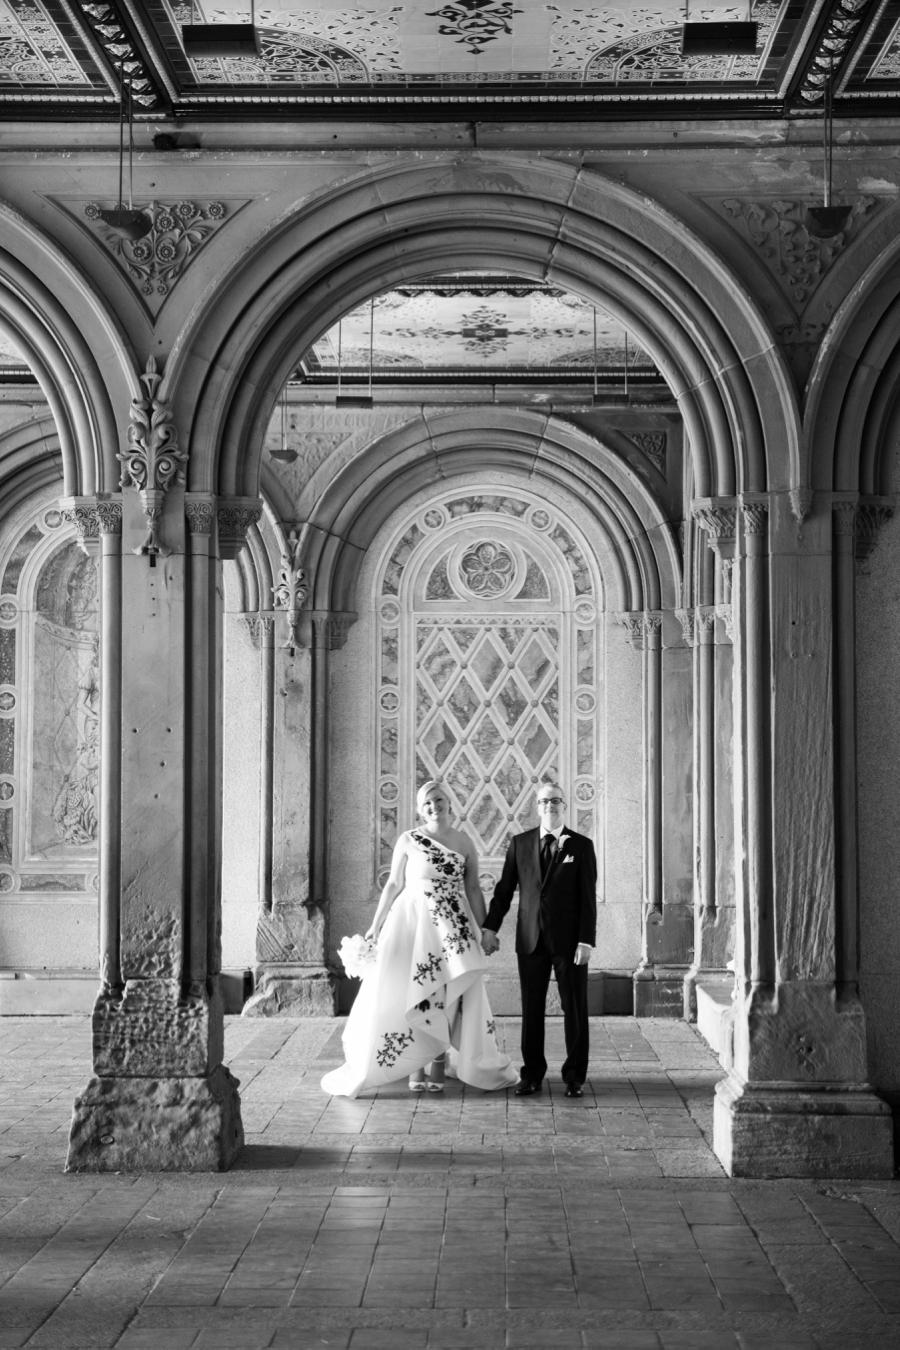 Gramercy_Park_Hotel_Wedding_NYC_DJ_43.jpg